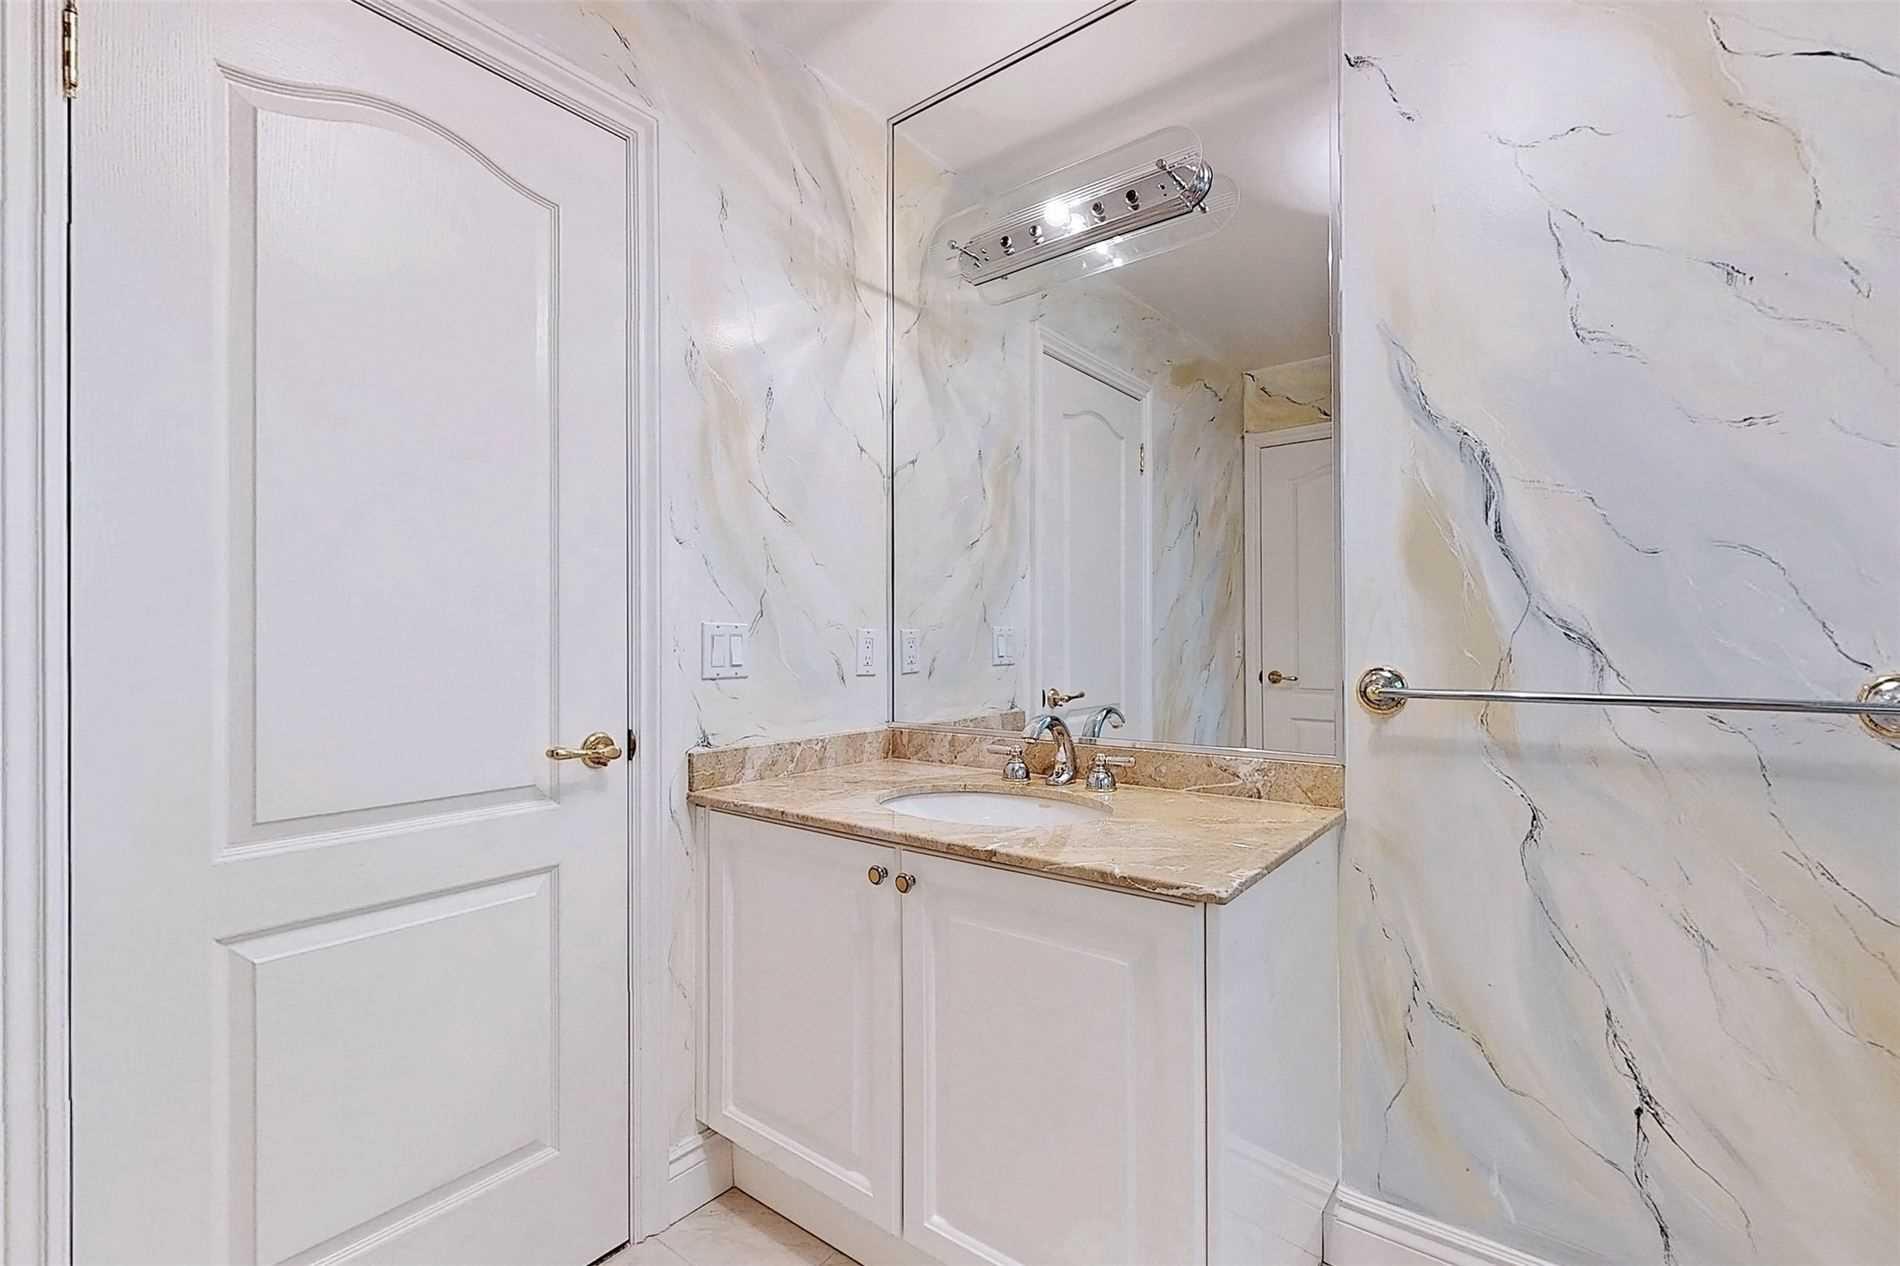 190 Brighton Ave, Toronto, Ontario M3H4E4, 4 Bedrooms Bedrooms, 14 Rooms Rooms,5 BathroomsBathrooms,Detached,For Sale,Brighton,C5359968